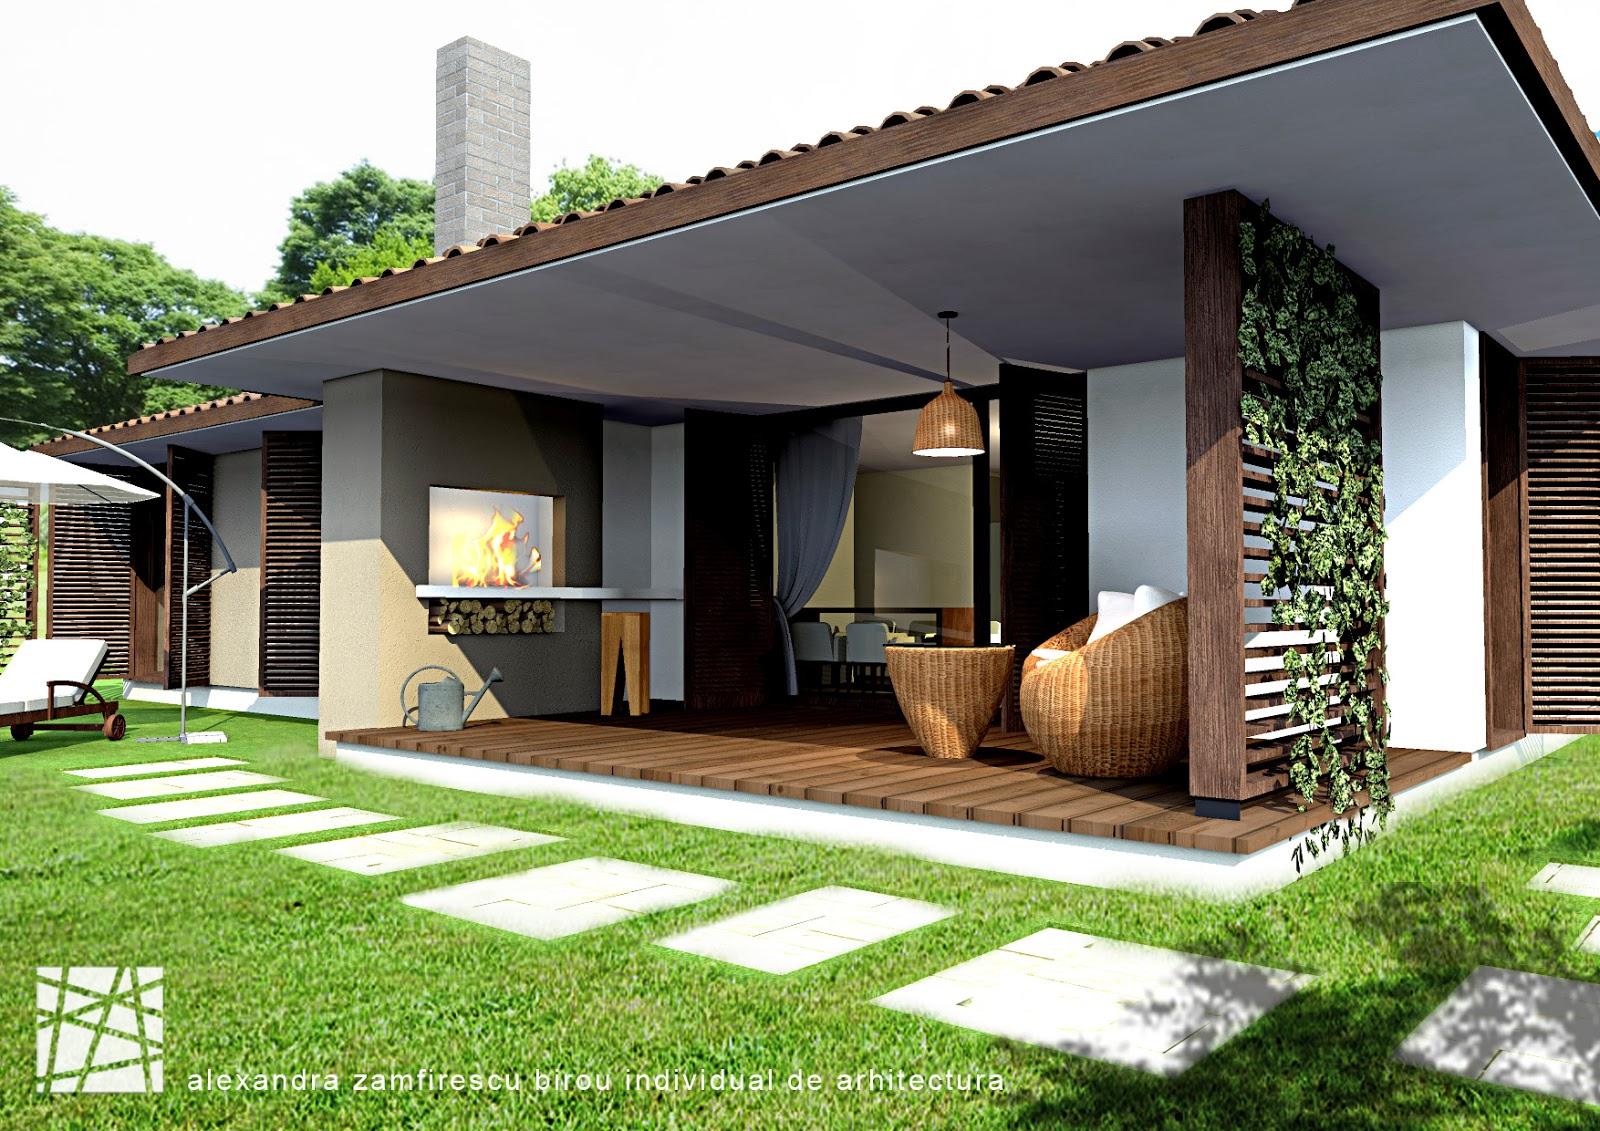 Arhitectura design locuinta parter 4 camere 120mp for Case parter 3 camere